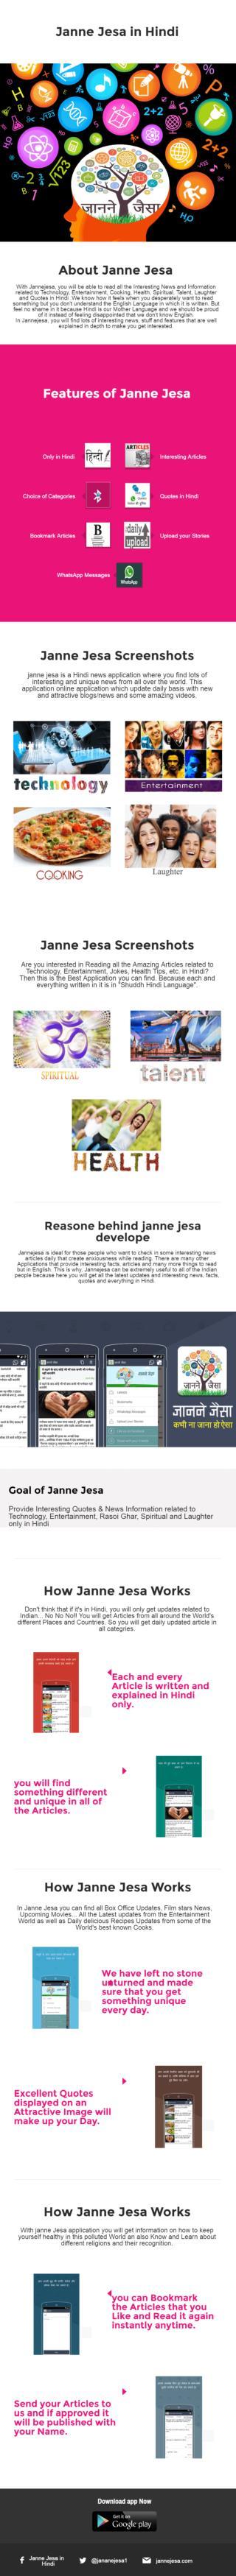 Janne Jesa Infographic